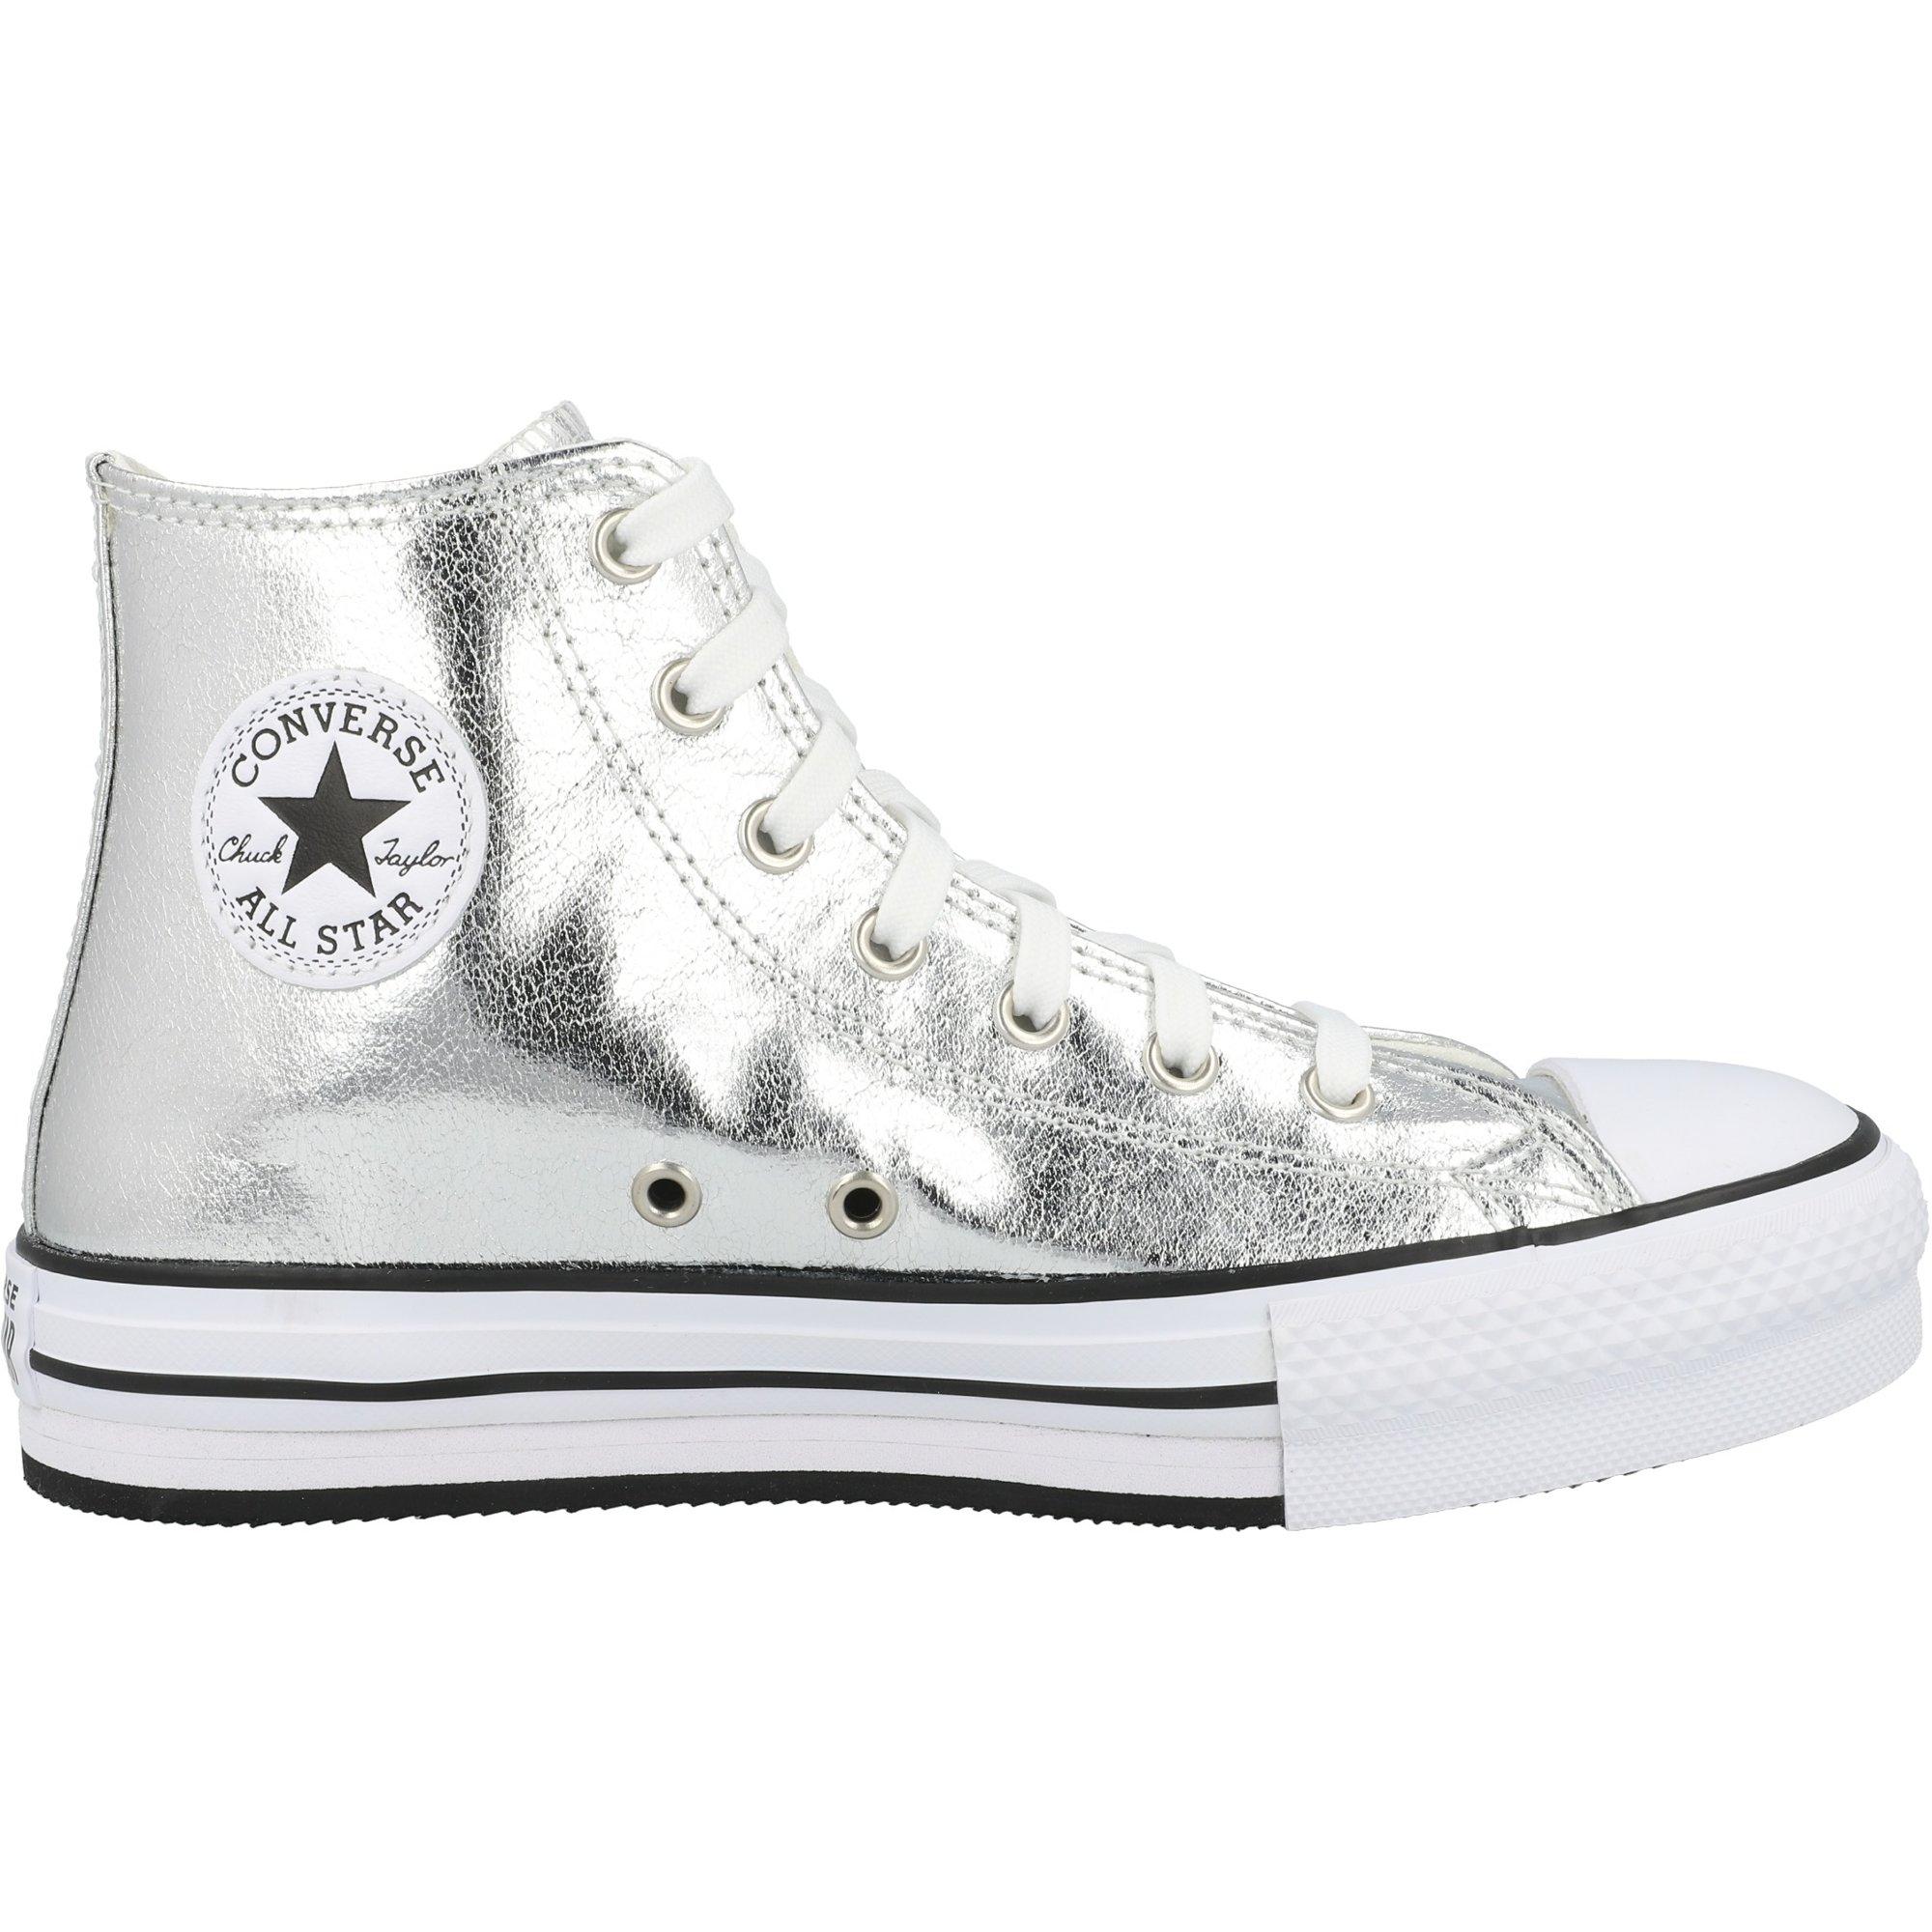 Converse Chuck Taylor All Star EVA Lift Hi Digital Powder Grey/Black Polyester